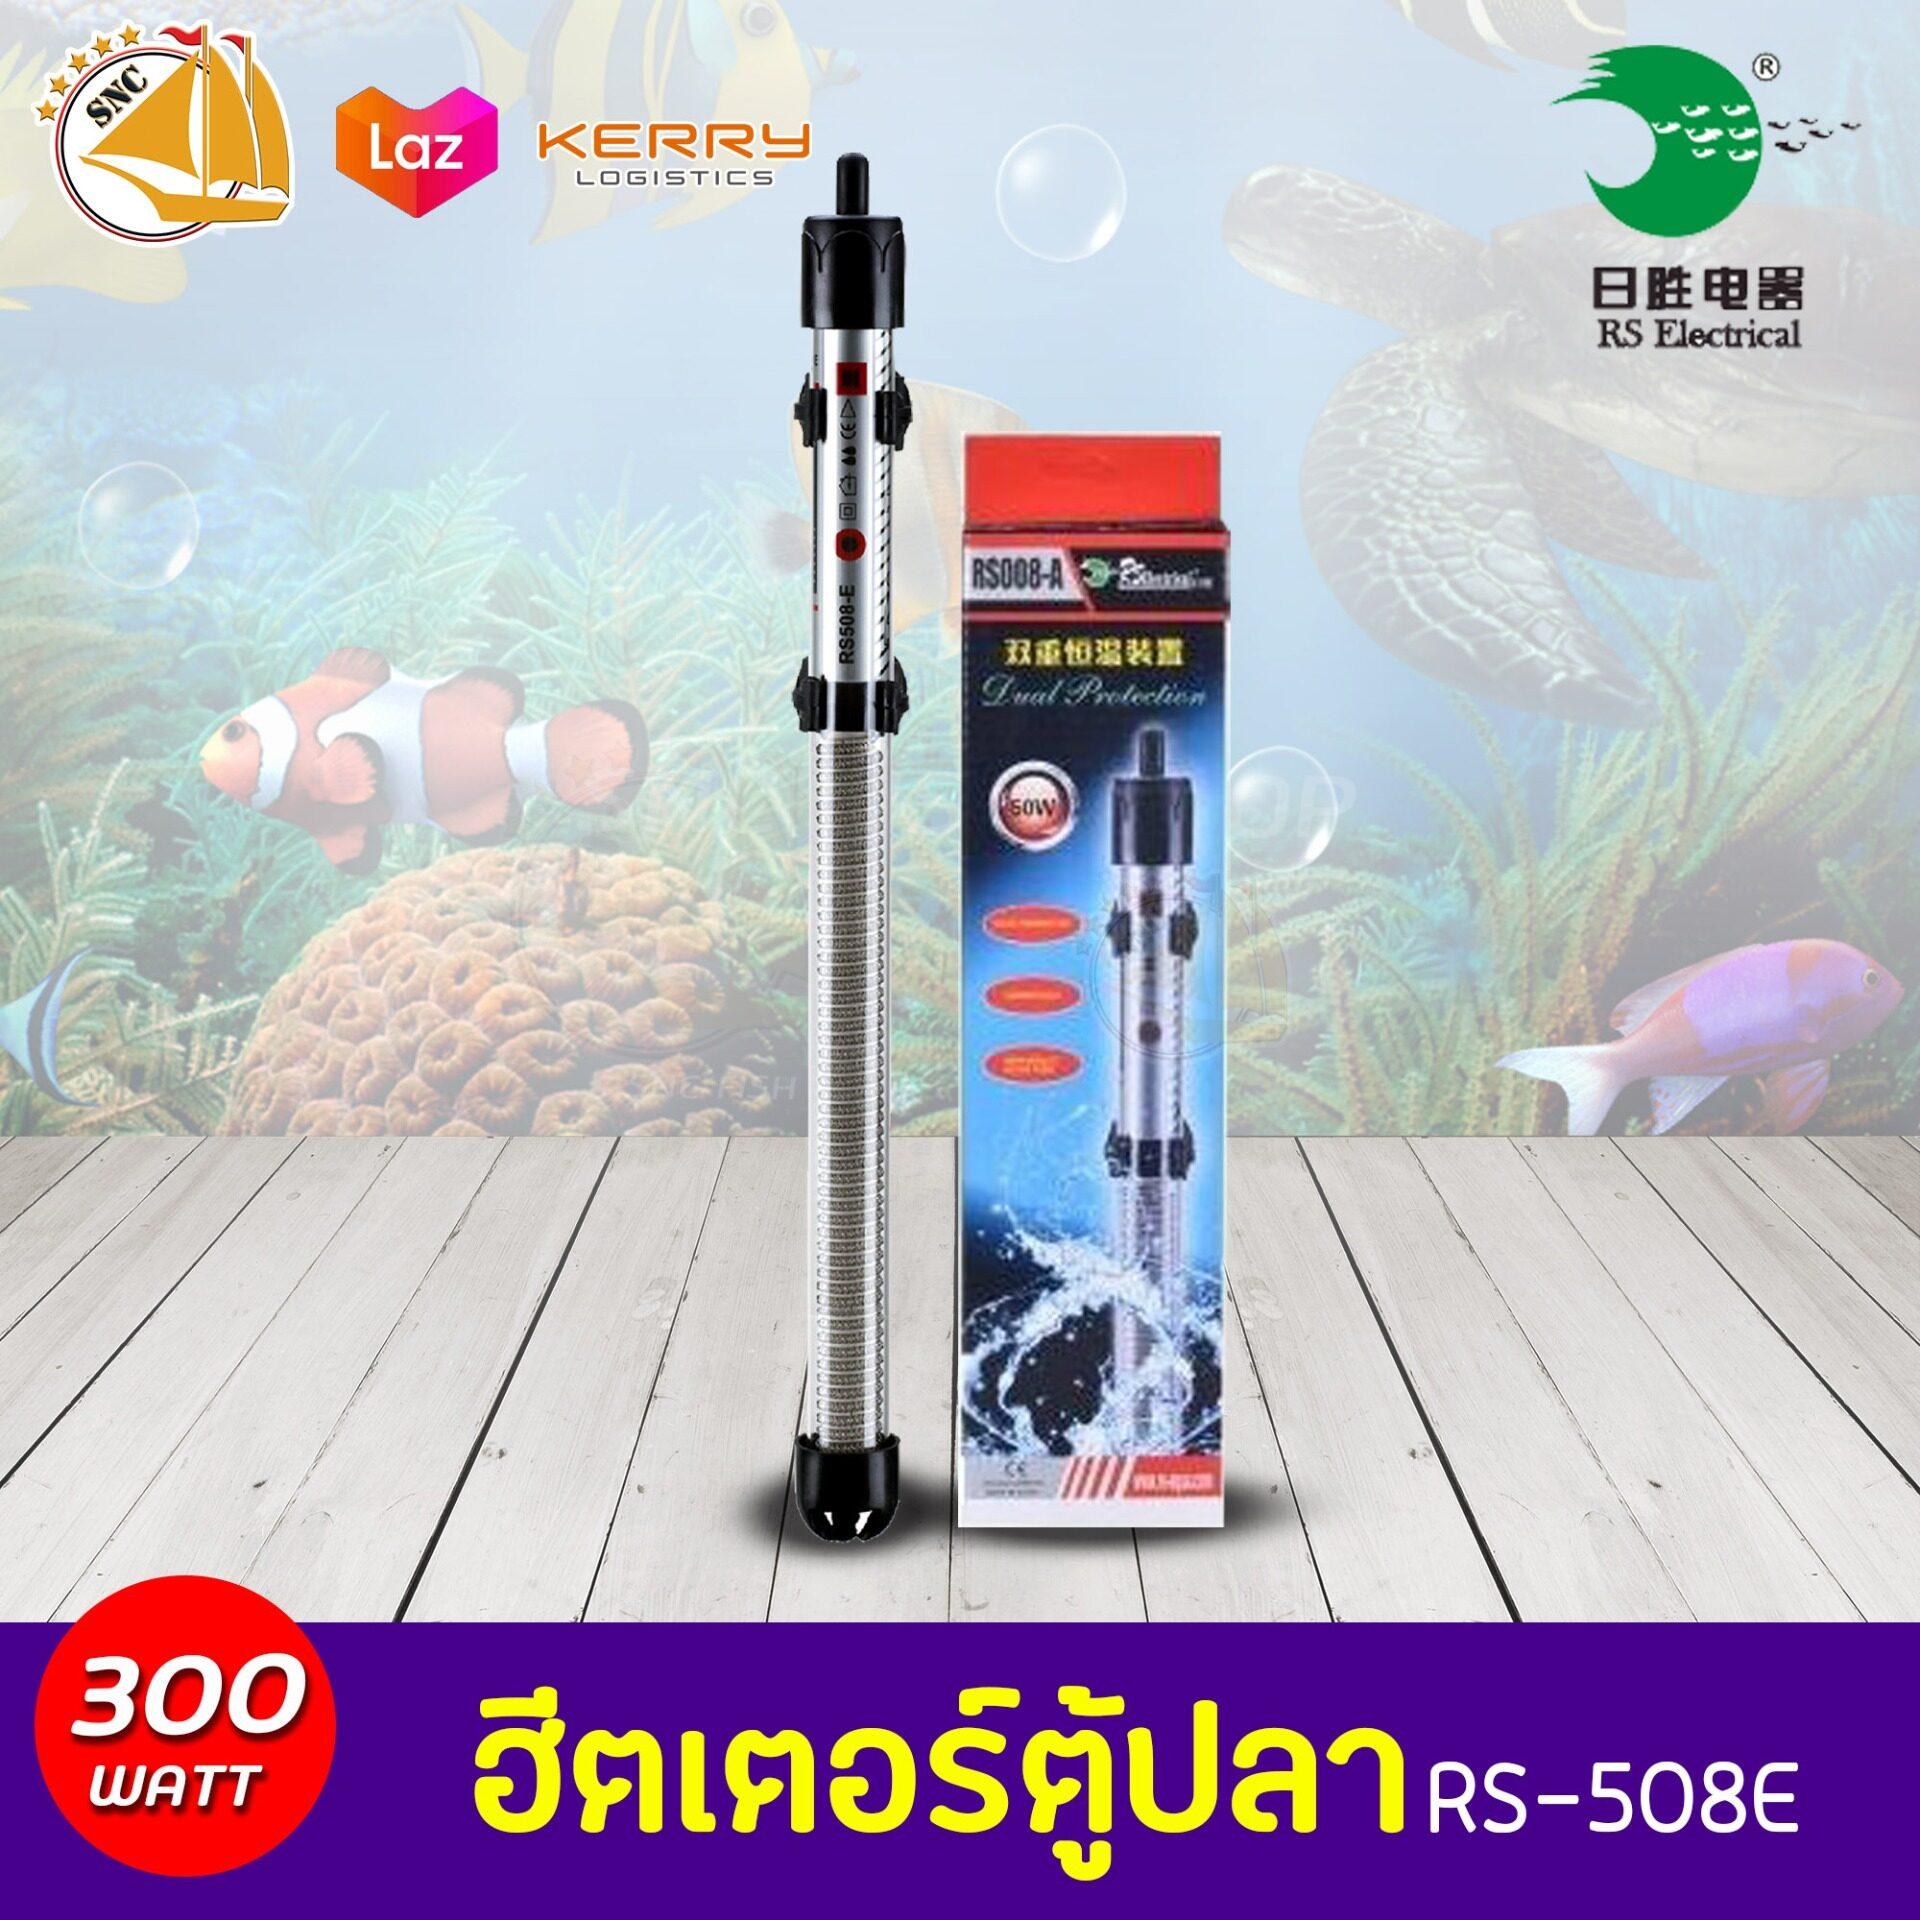 RS Electrical RS-508E Heater 300W ฮีดเตอร์ เครื่องควบคุมอุณหภูมิน้ำในตู้ปลาขนาด 48-60นิ้ว